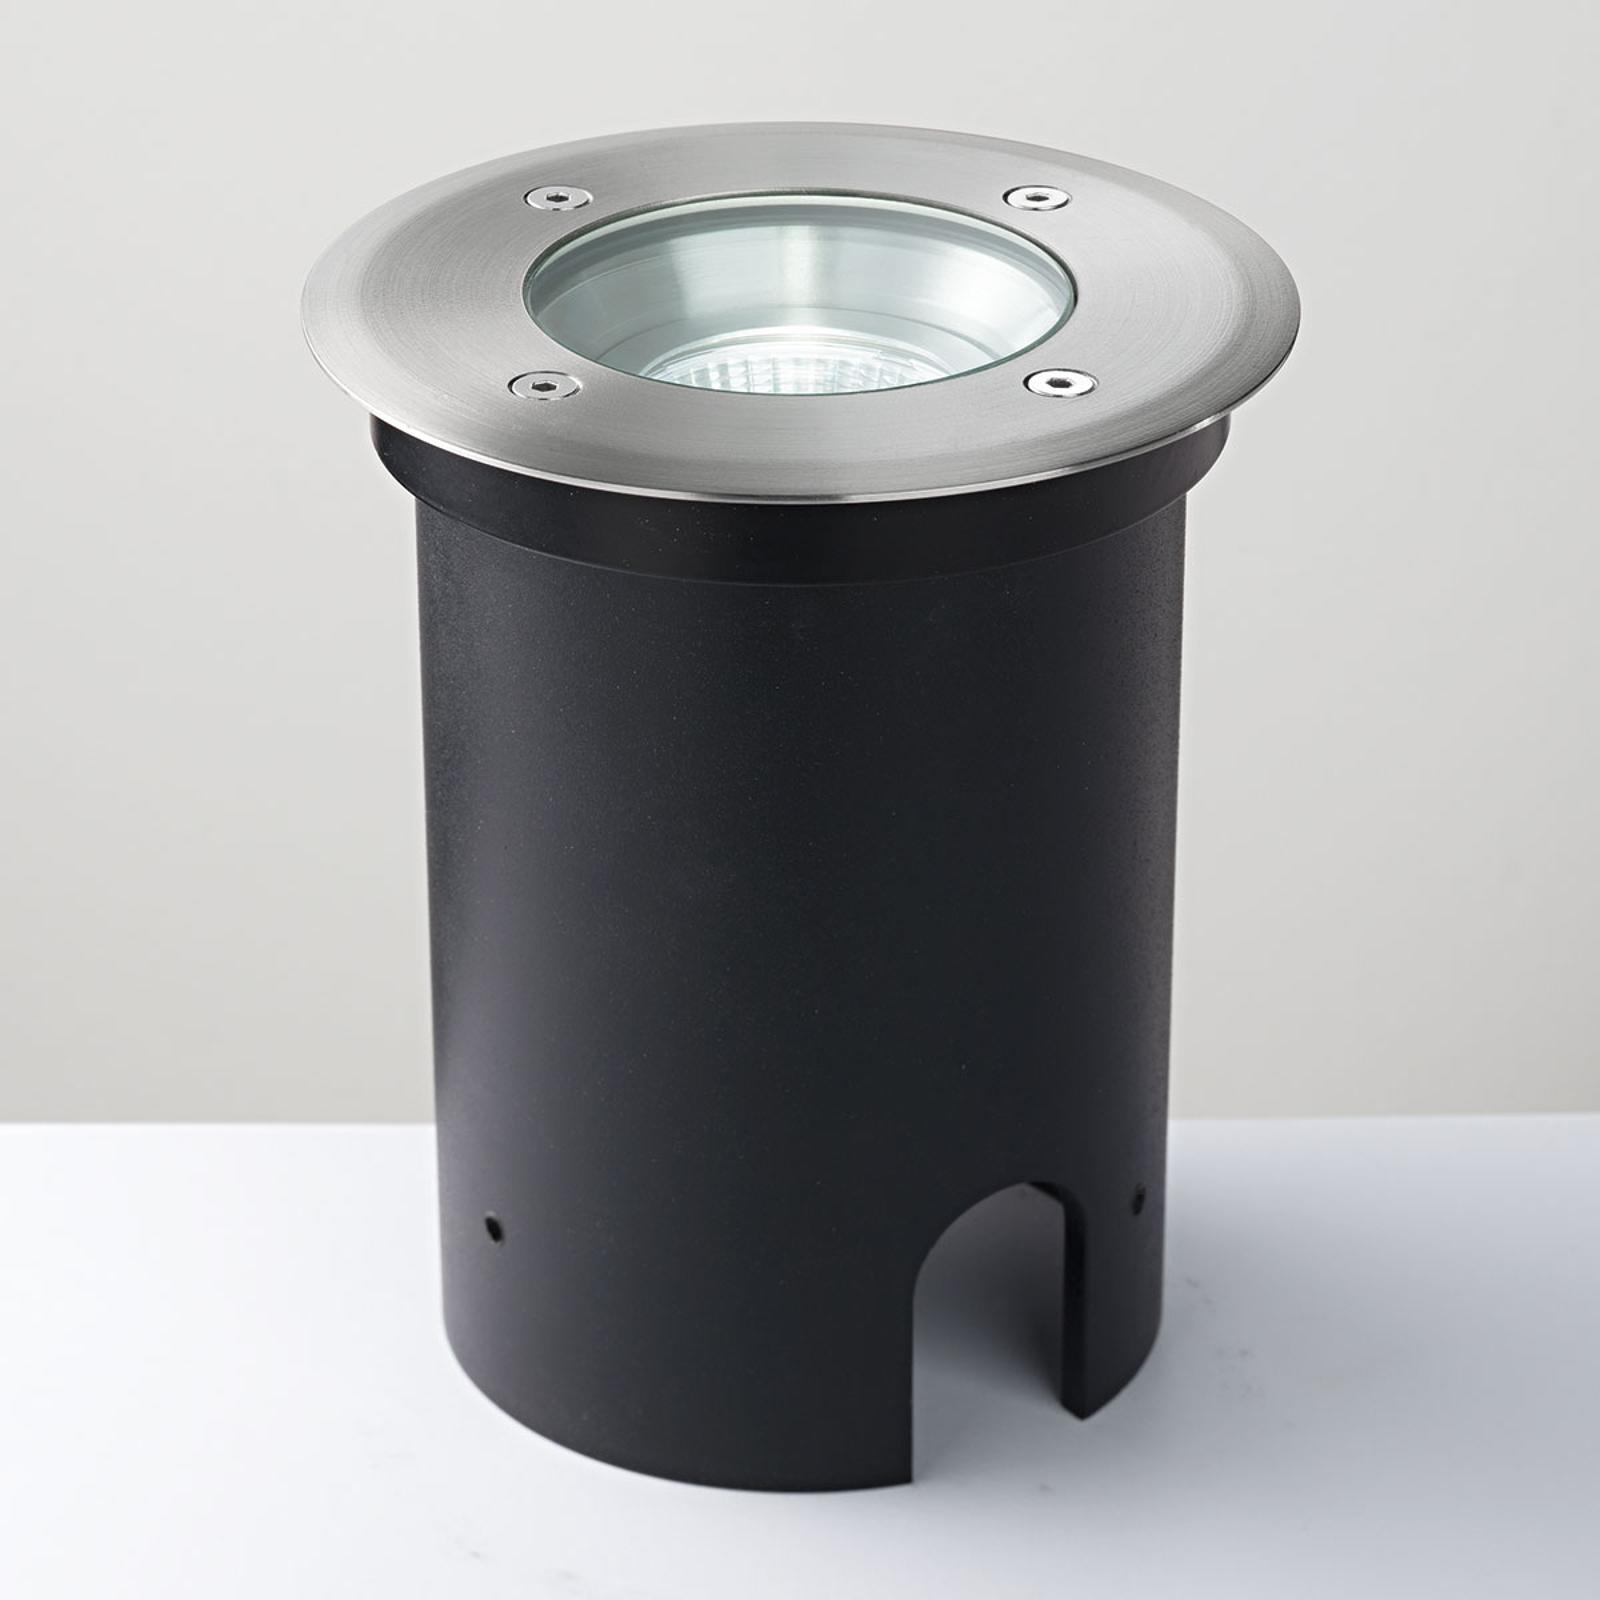 Foco de suelo LED empotrado Scotty 3, IP67